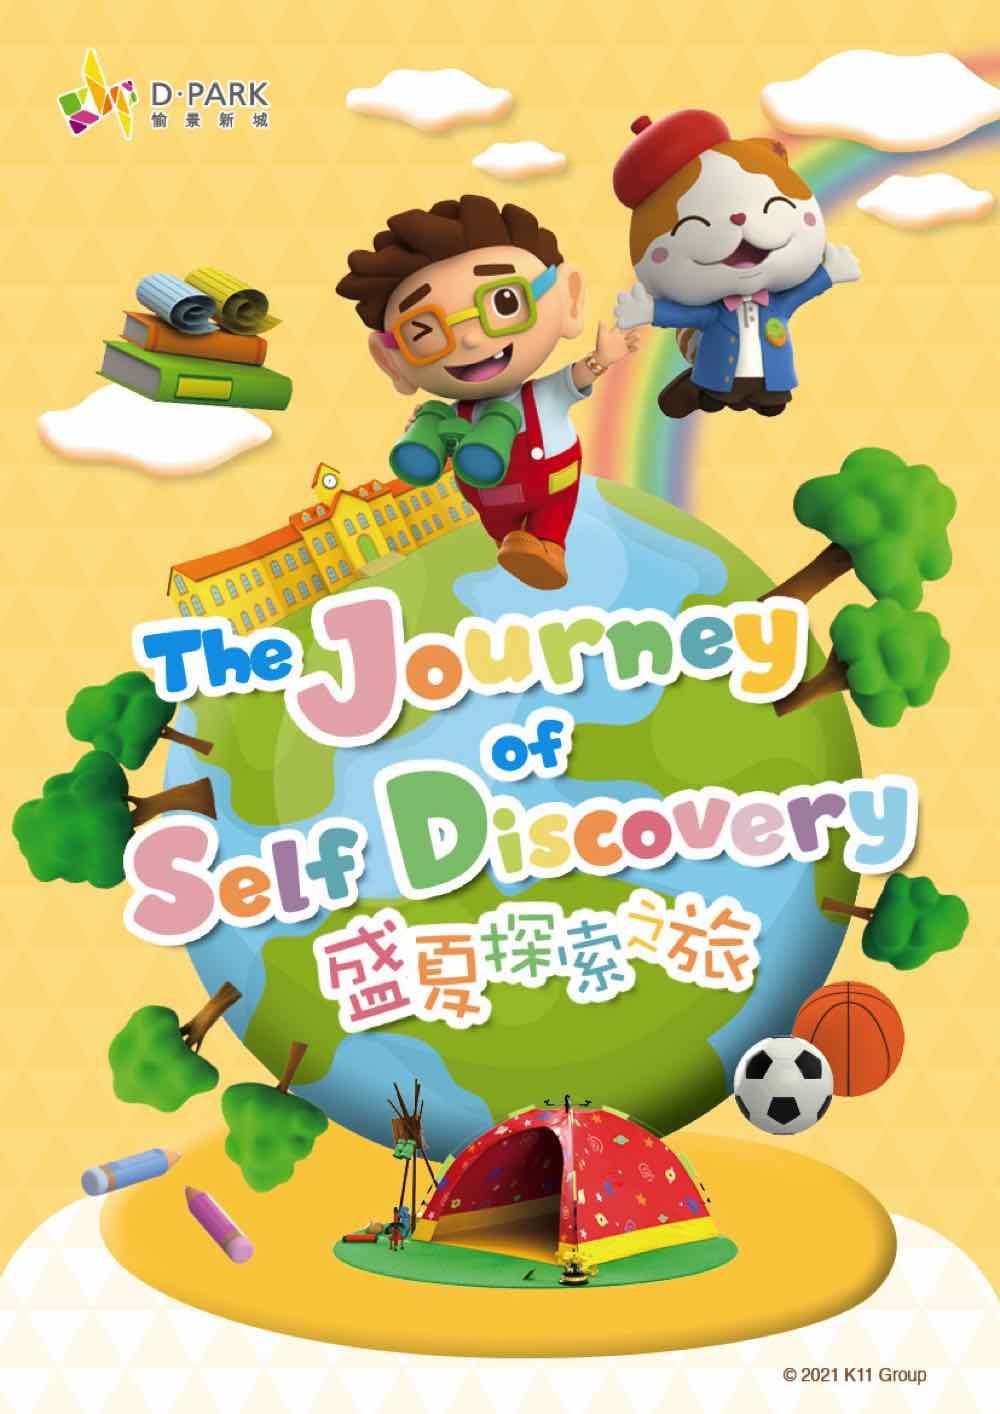 D·PARK 愉景新城「 盛夏探索之旅 」 Donut & Ah Meow 發掘孩童多元智能